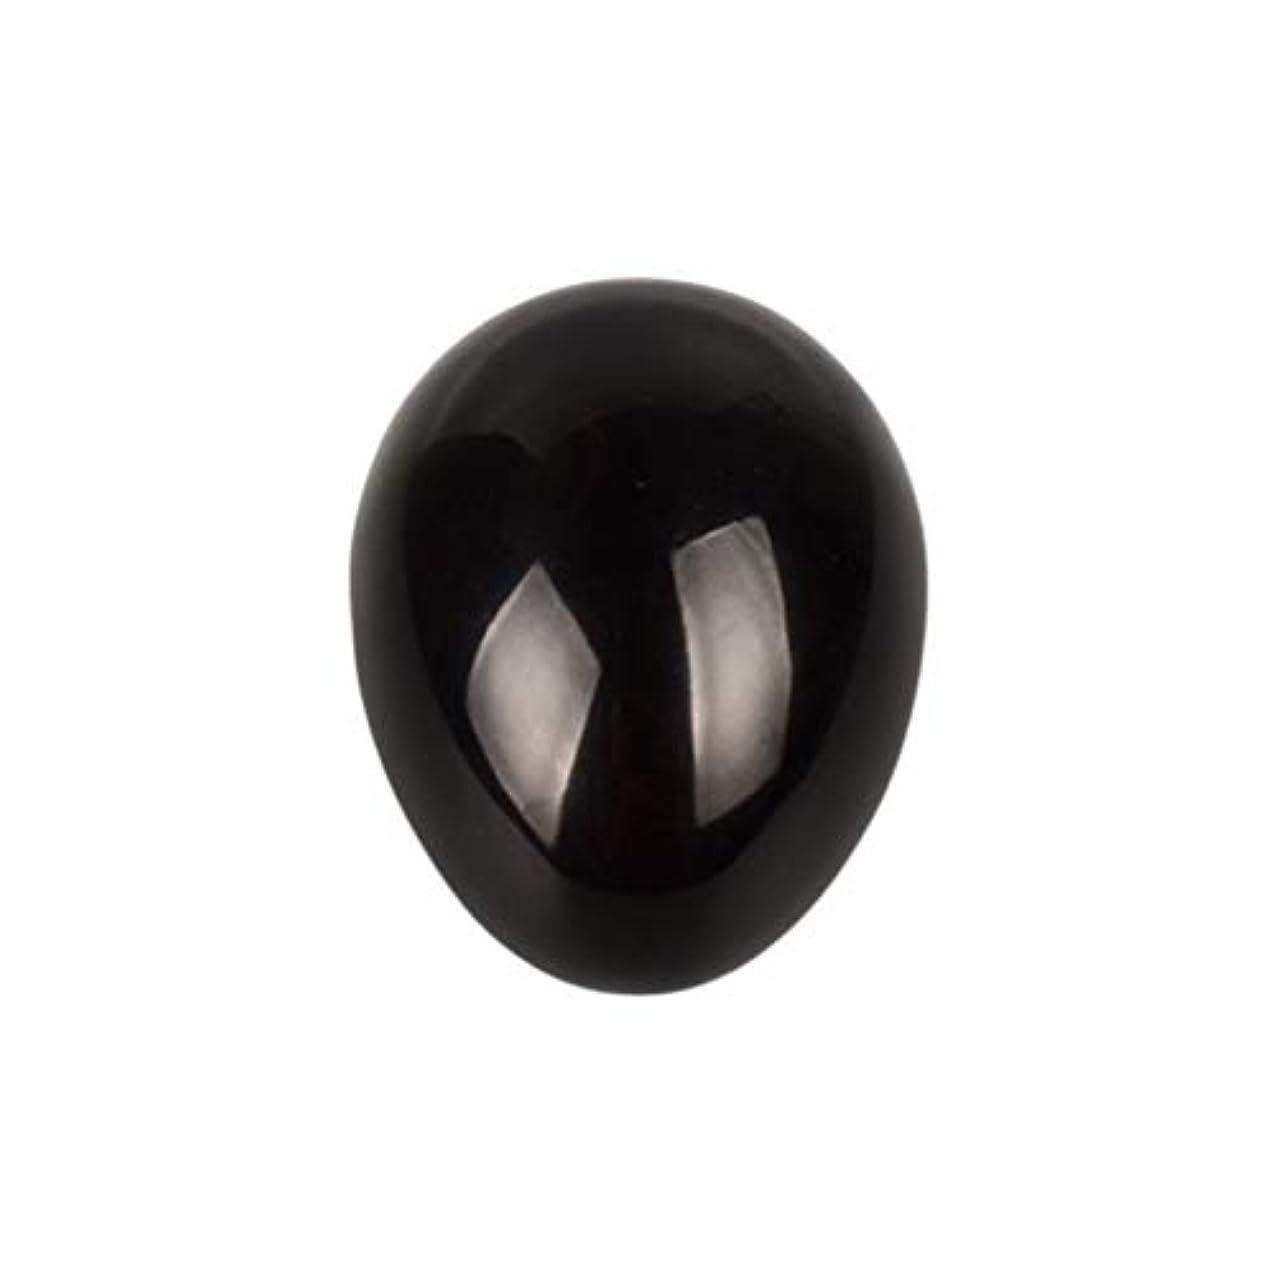 HEALIFTY 黒曜石の癒し瞑想のための黒曜石の卵球